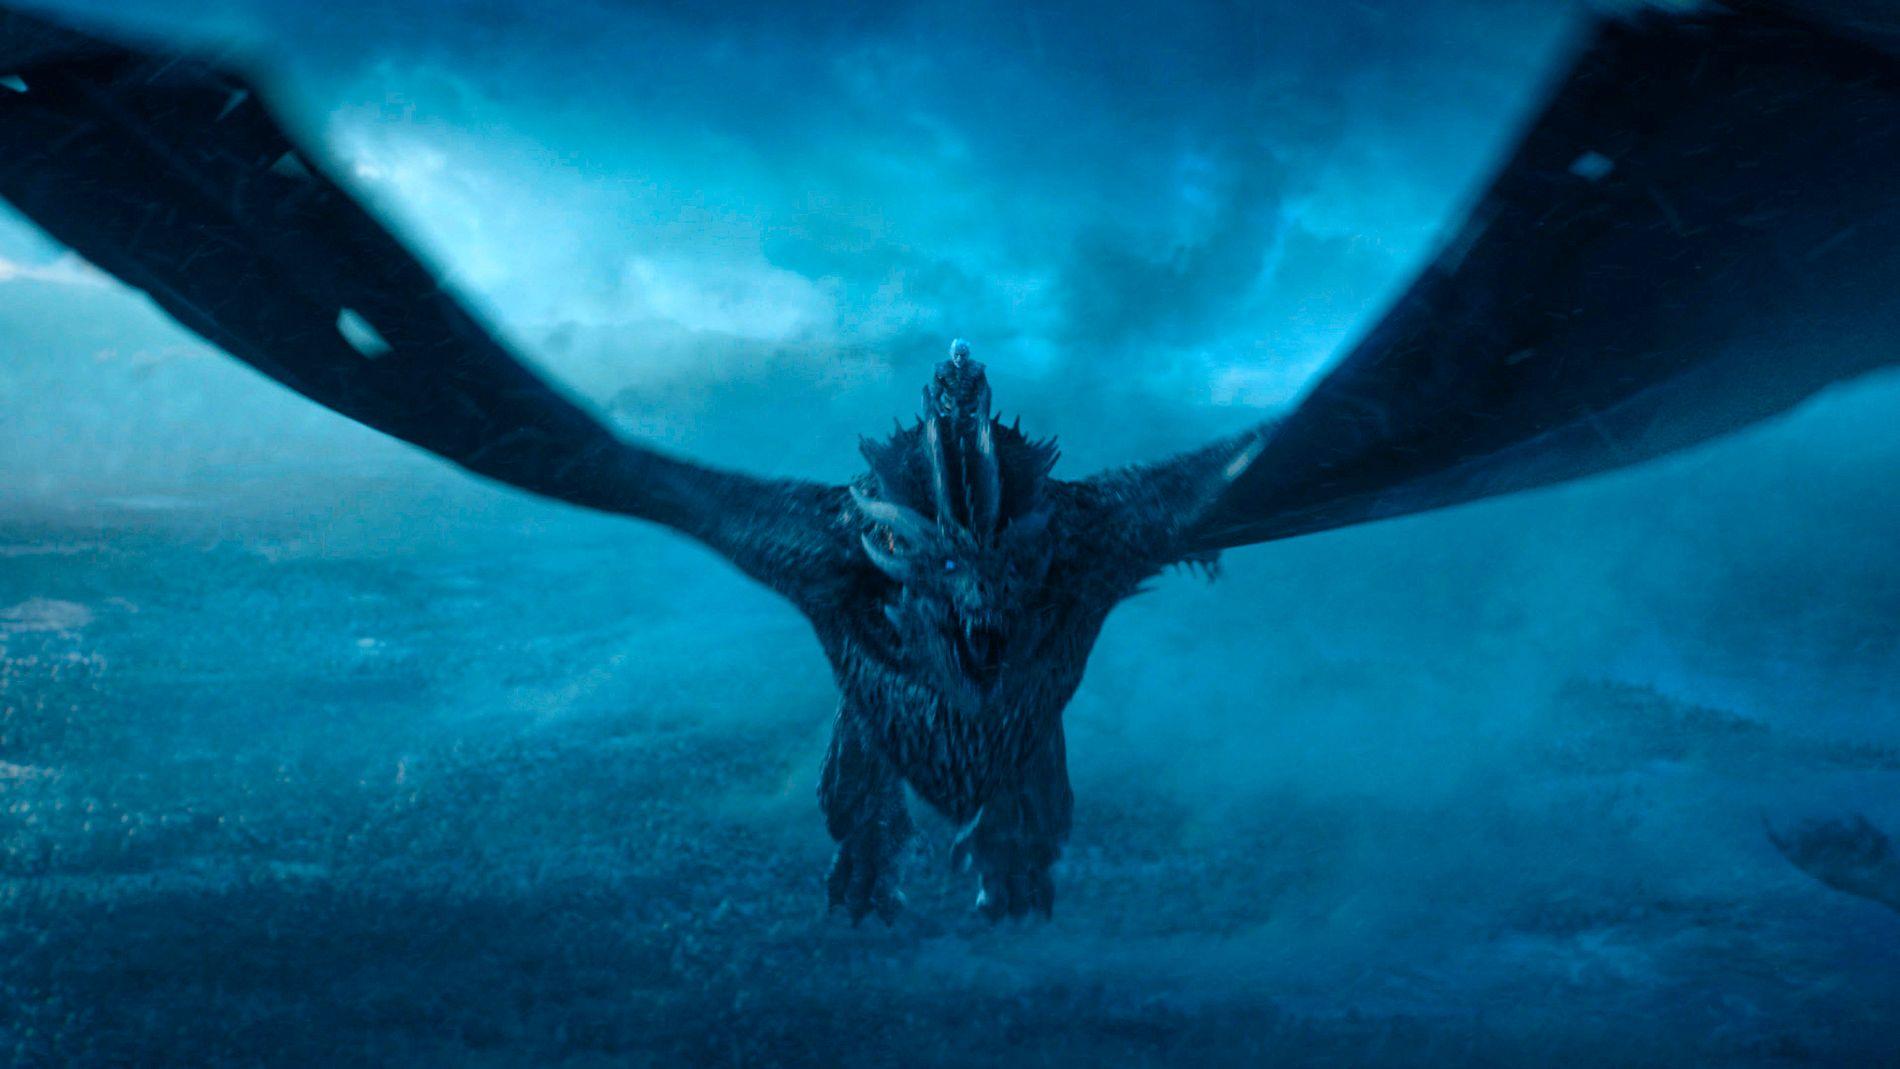 SESONGPREMIERE: Den populære fantasyserien «Game of Thrones», som baserer seg på George RR Martins bøker, ble første gang sendt i 2011.